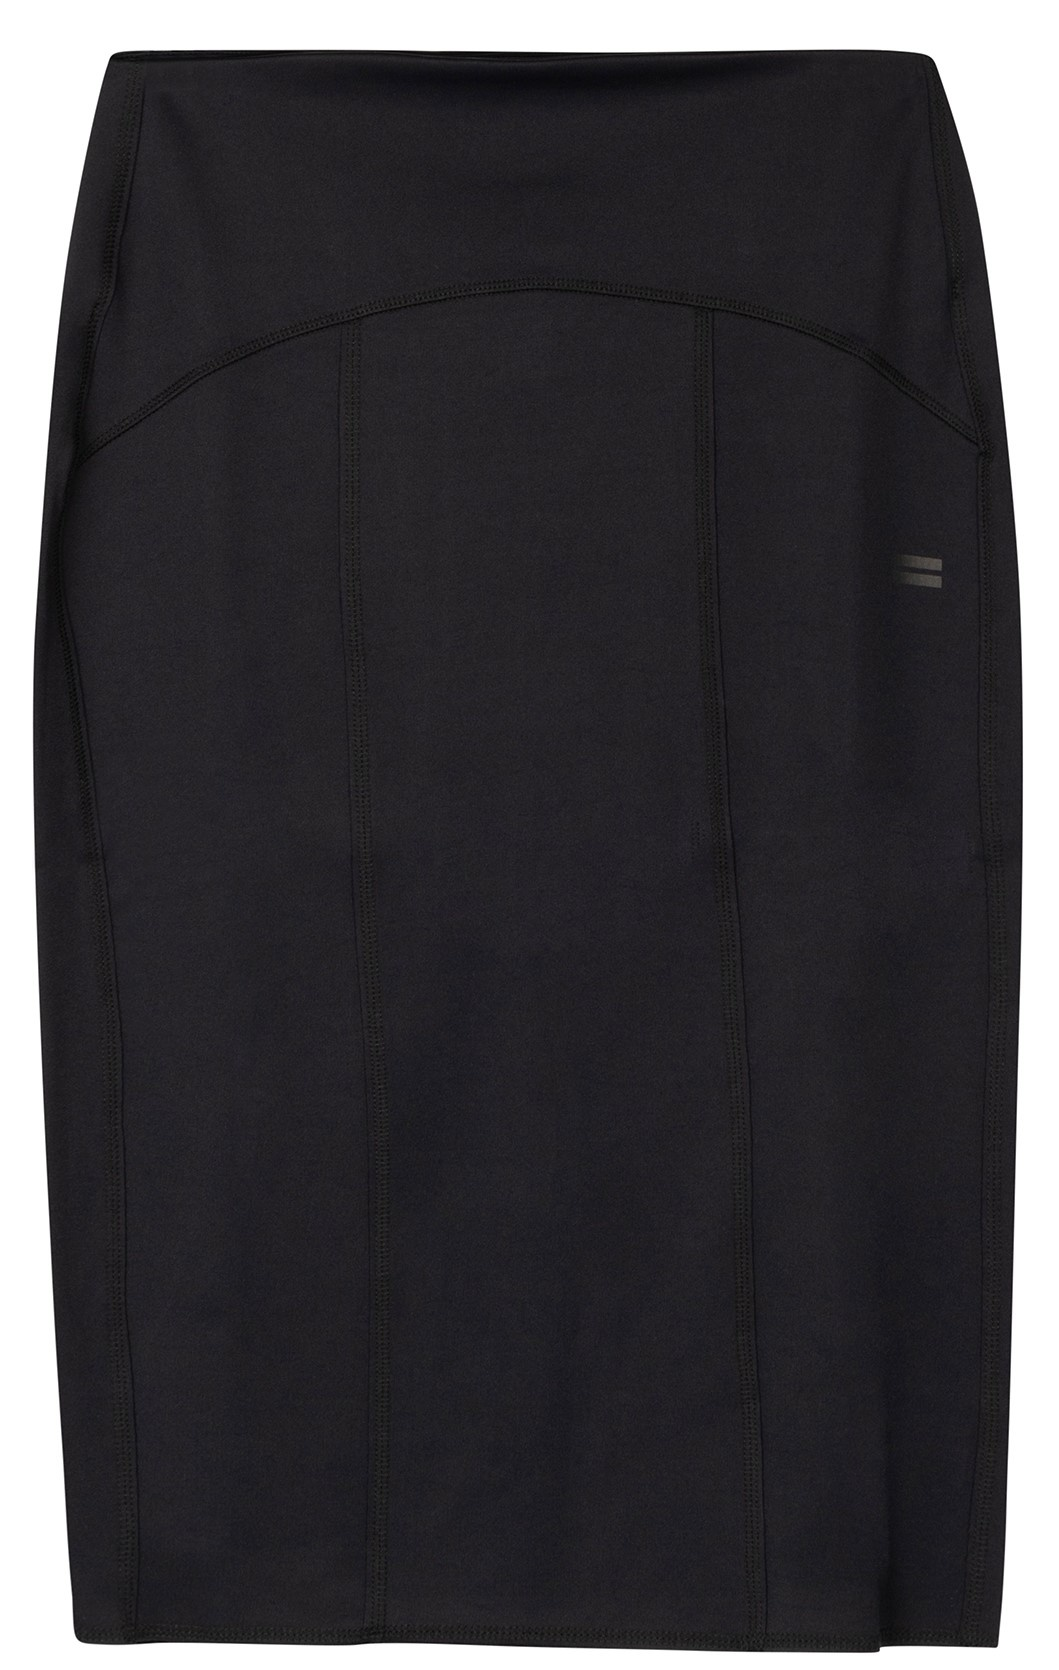 Rok scuba pencil skirt black-1